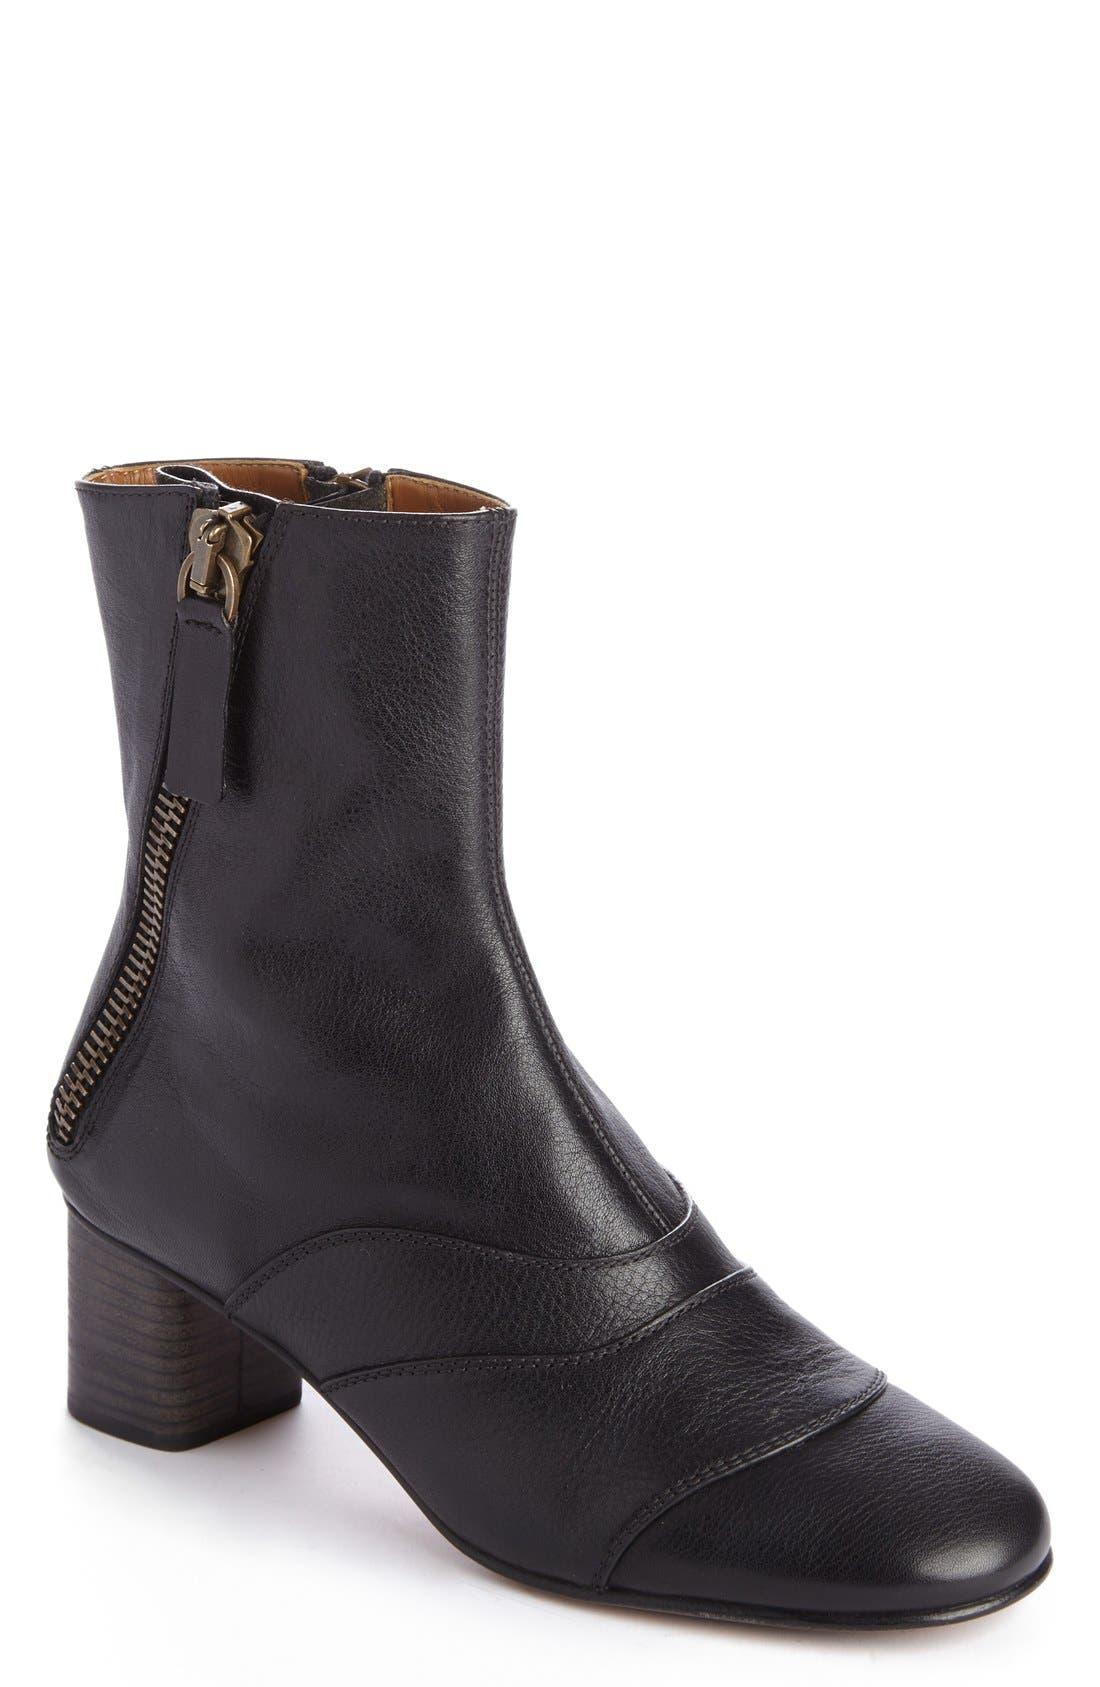 CHLOÉ 'Lexie' Block Heel Boot